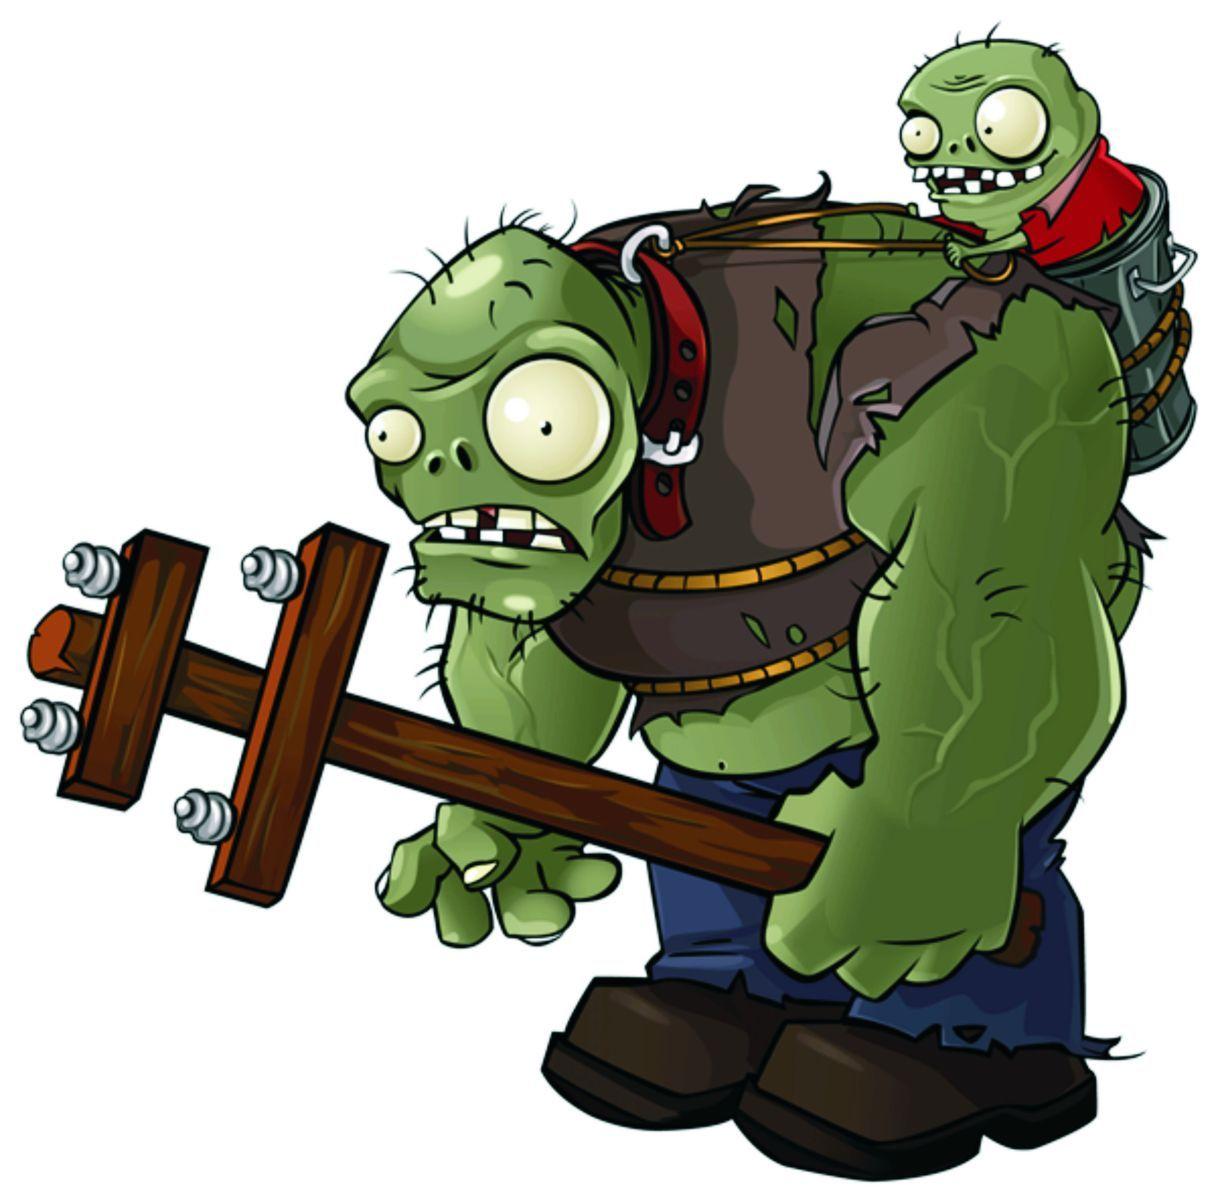 Gargantuar + Im | Porter in 2019 | Plants vs zombies, Zombie